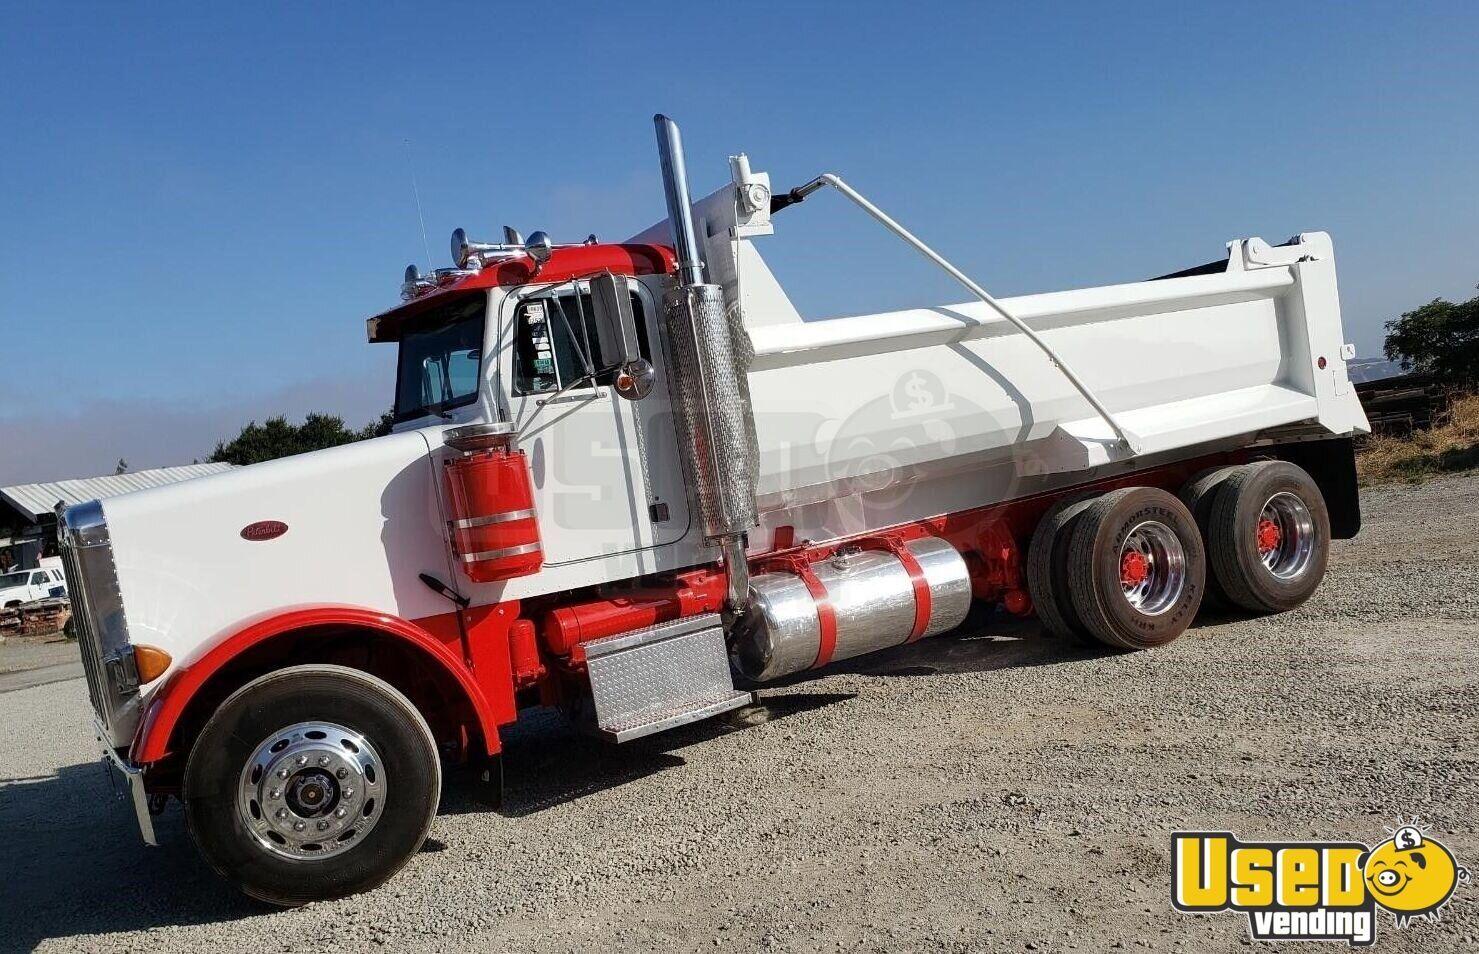 1988 Peterbilt 379 Dump Truck 16 Heil Rock Cat 3406b 13 Speed For Sale In California Usedvending Dumpt Peterbilt Dump Trucks Dump Trucks For Sale Peterbilt